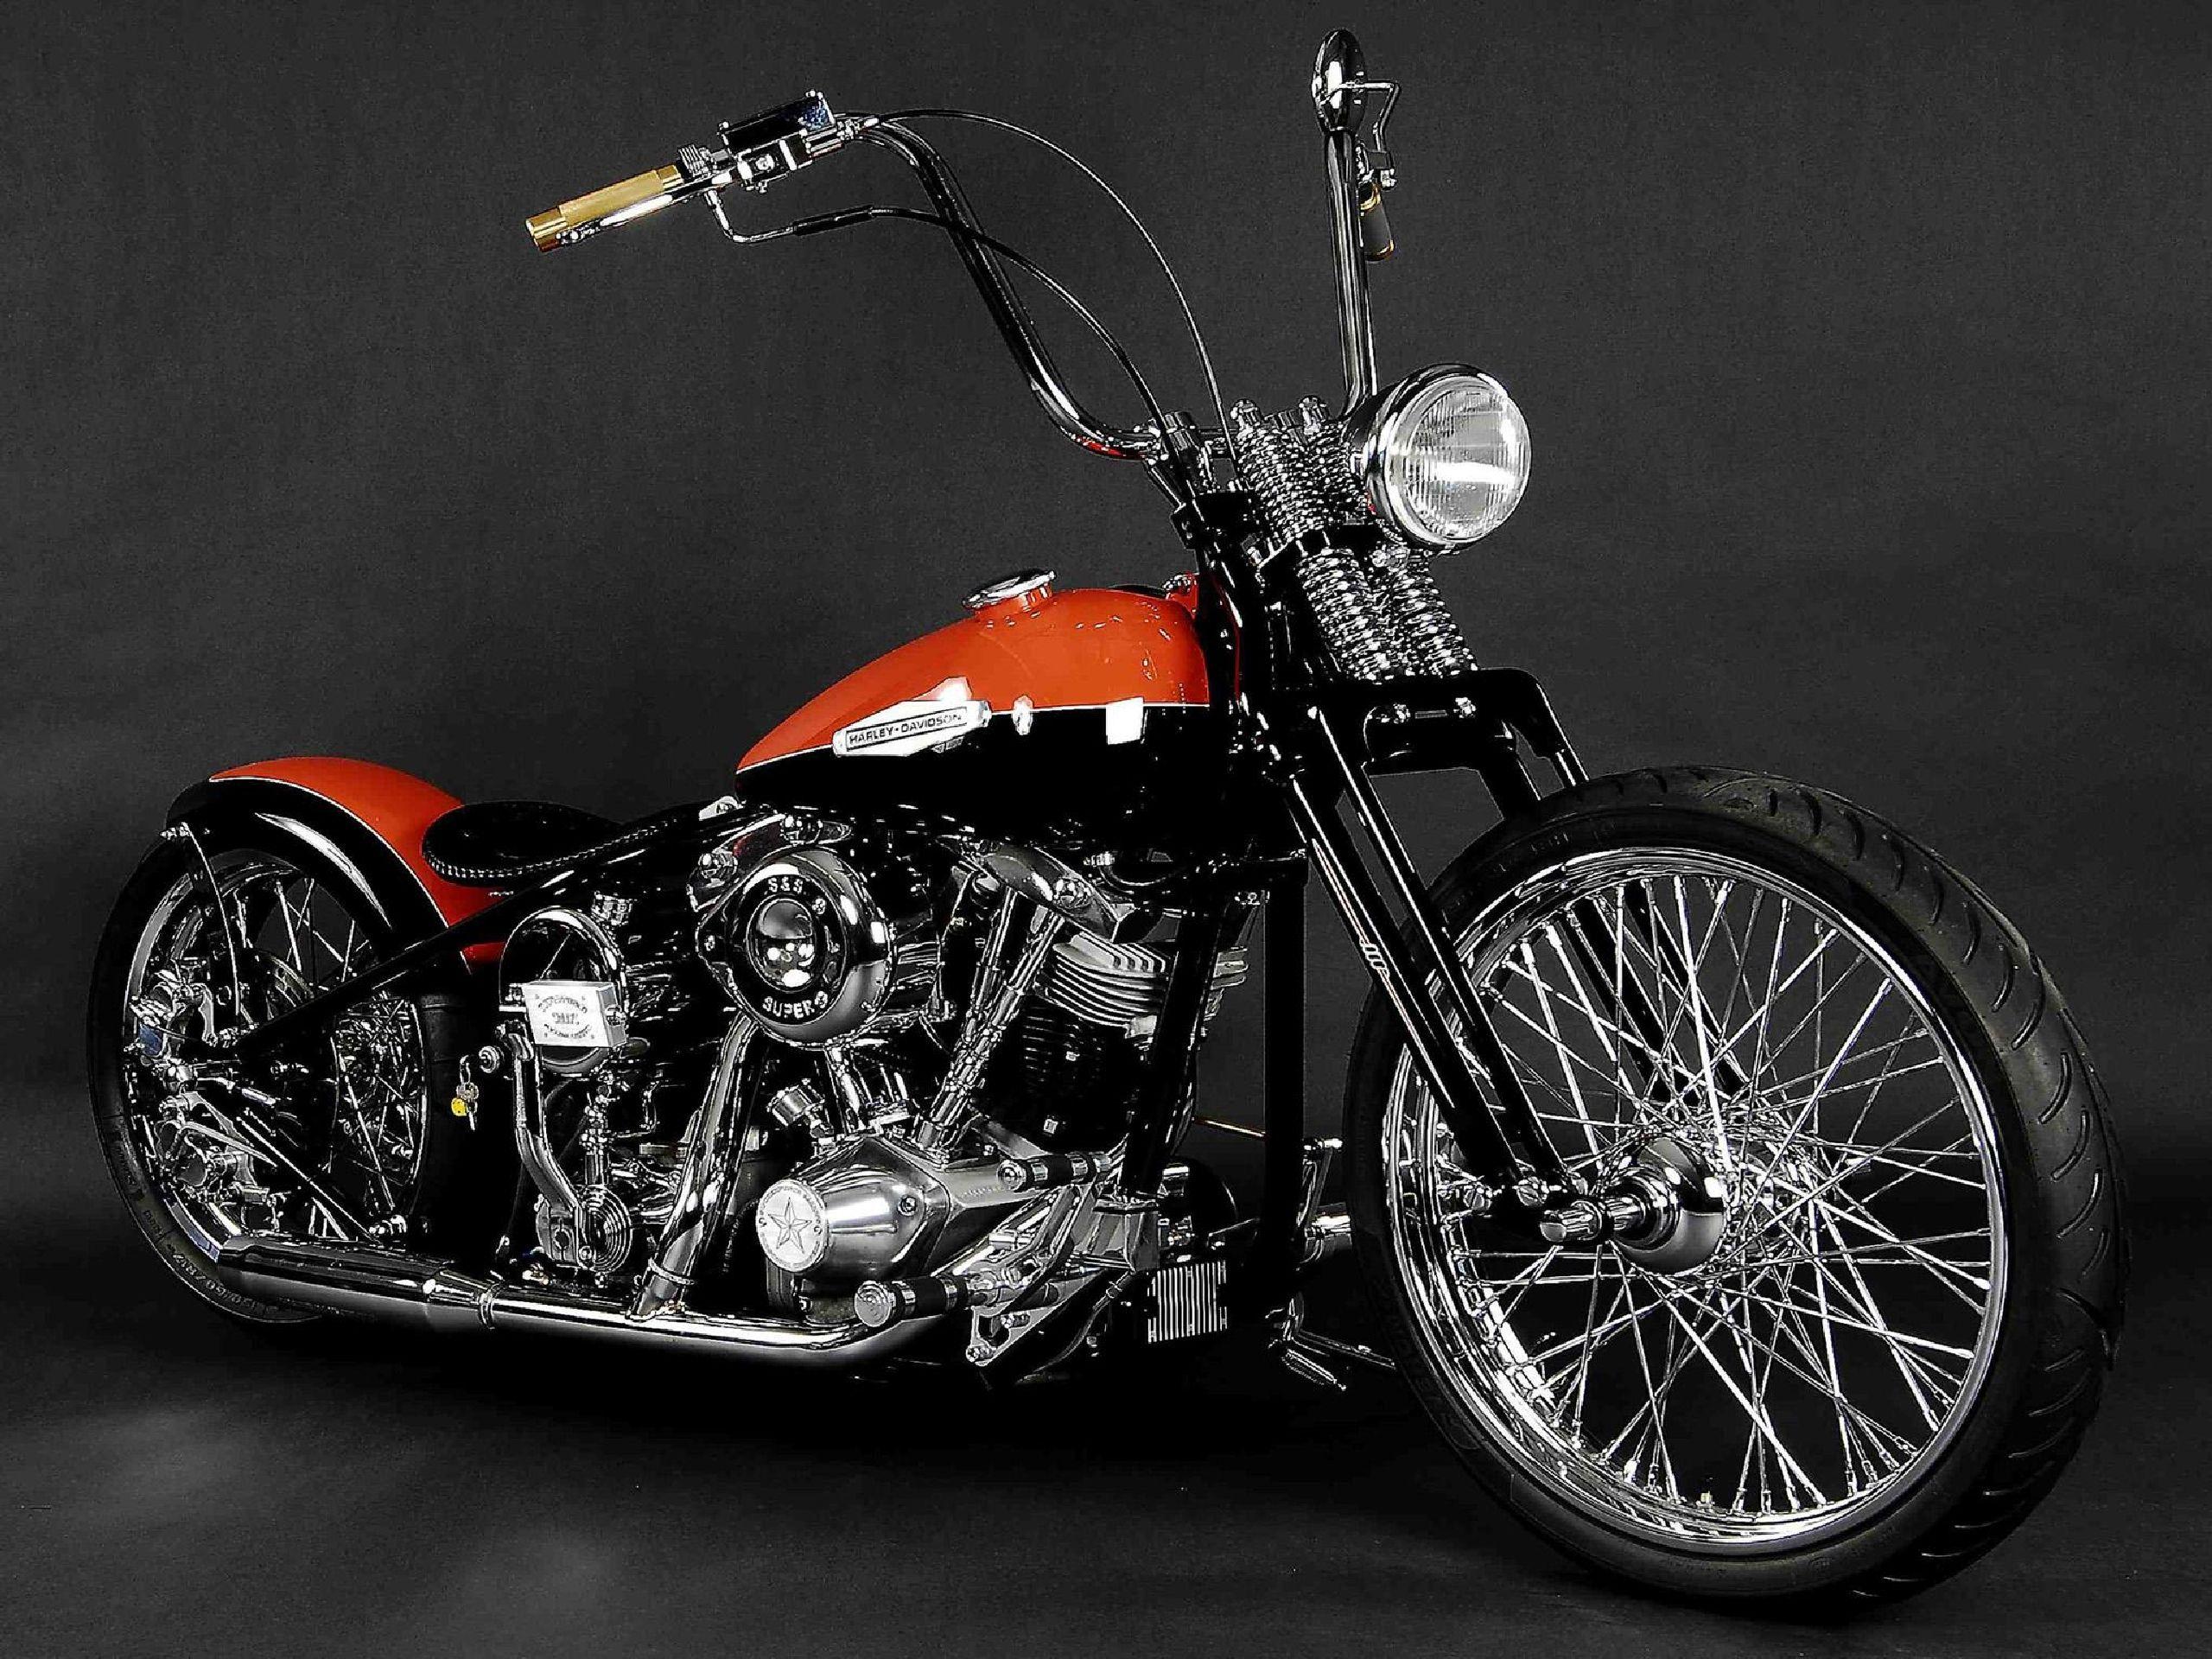 Best Classic Harley Davidson Wallpaper Wide 10706 Wallpaper